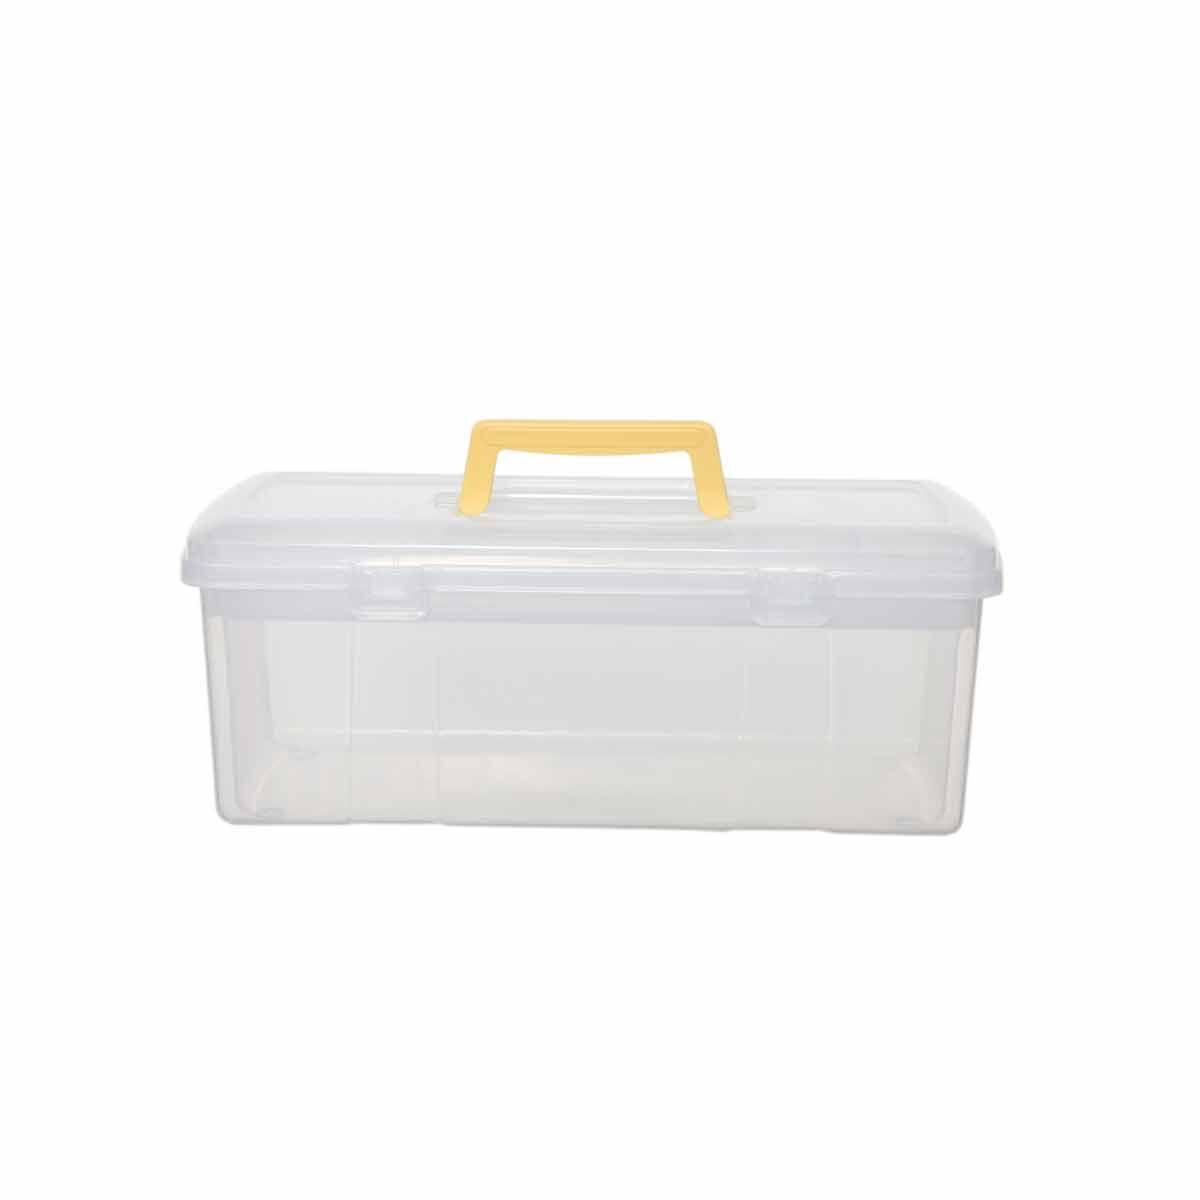 Whitefurze Utility Box with Tray 5 Litre